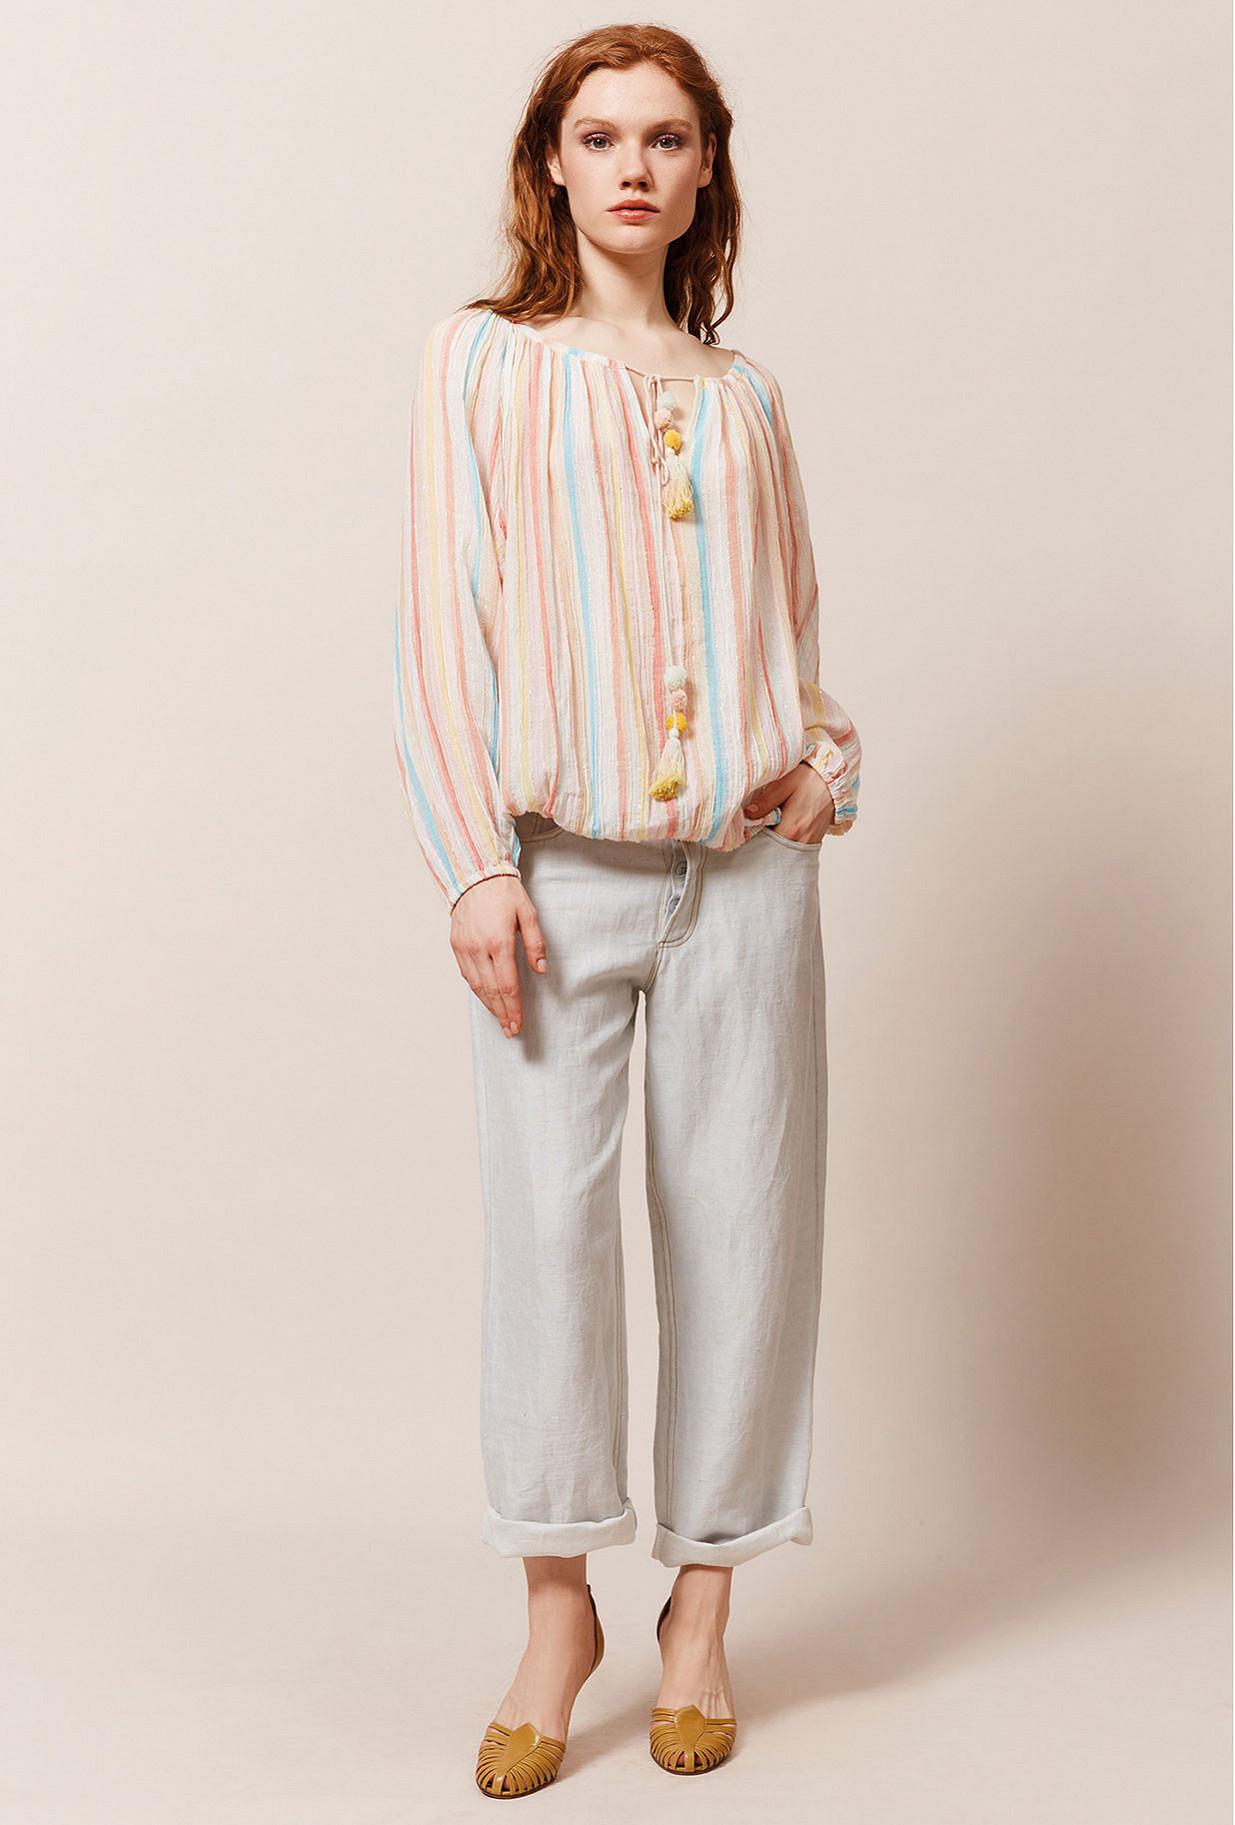 Paris clothes store Blouse  Rosita french designer fashion Paris